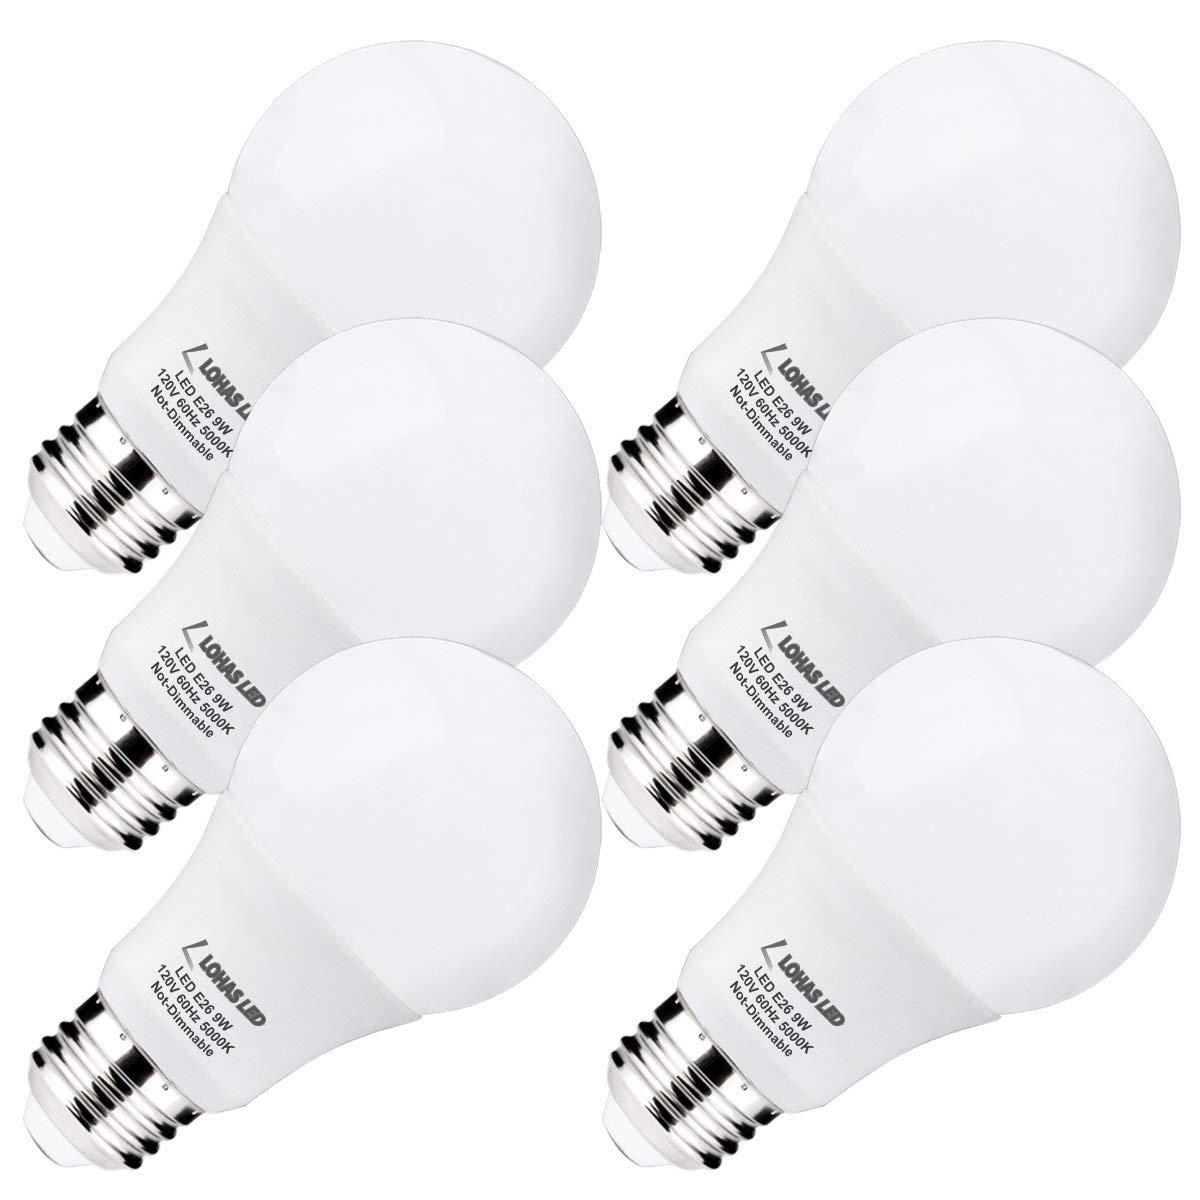 LOHAS A19 LED Bulb Daylight Light, 60Watt Bulbs Equivalent